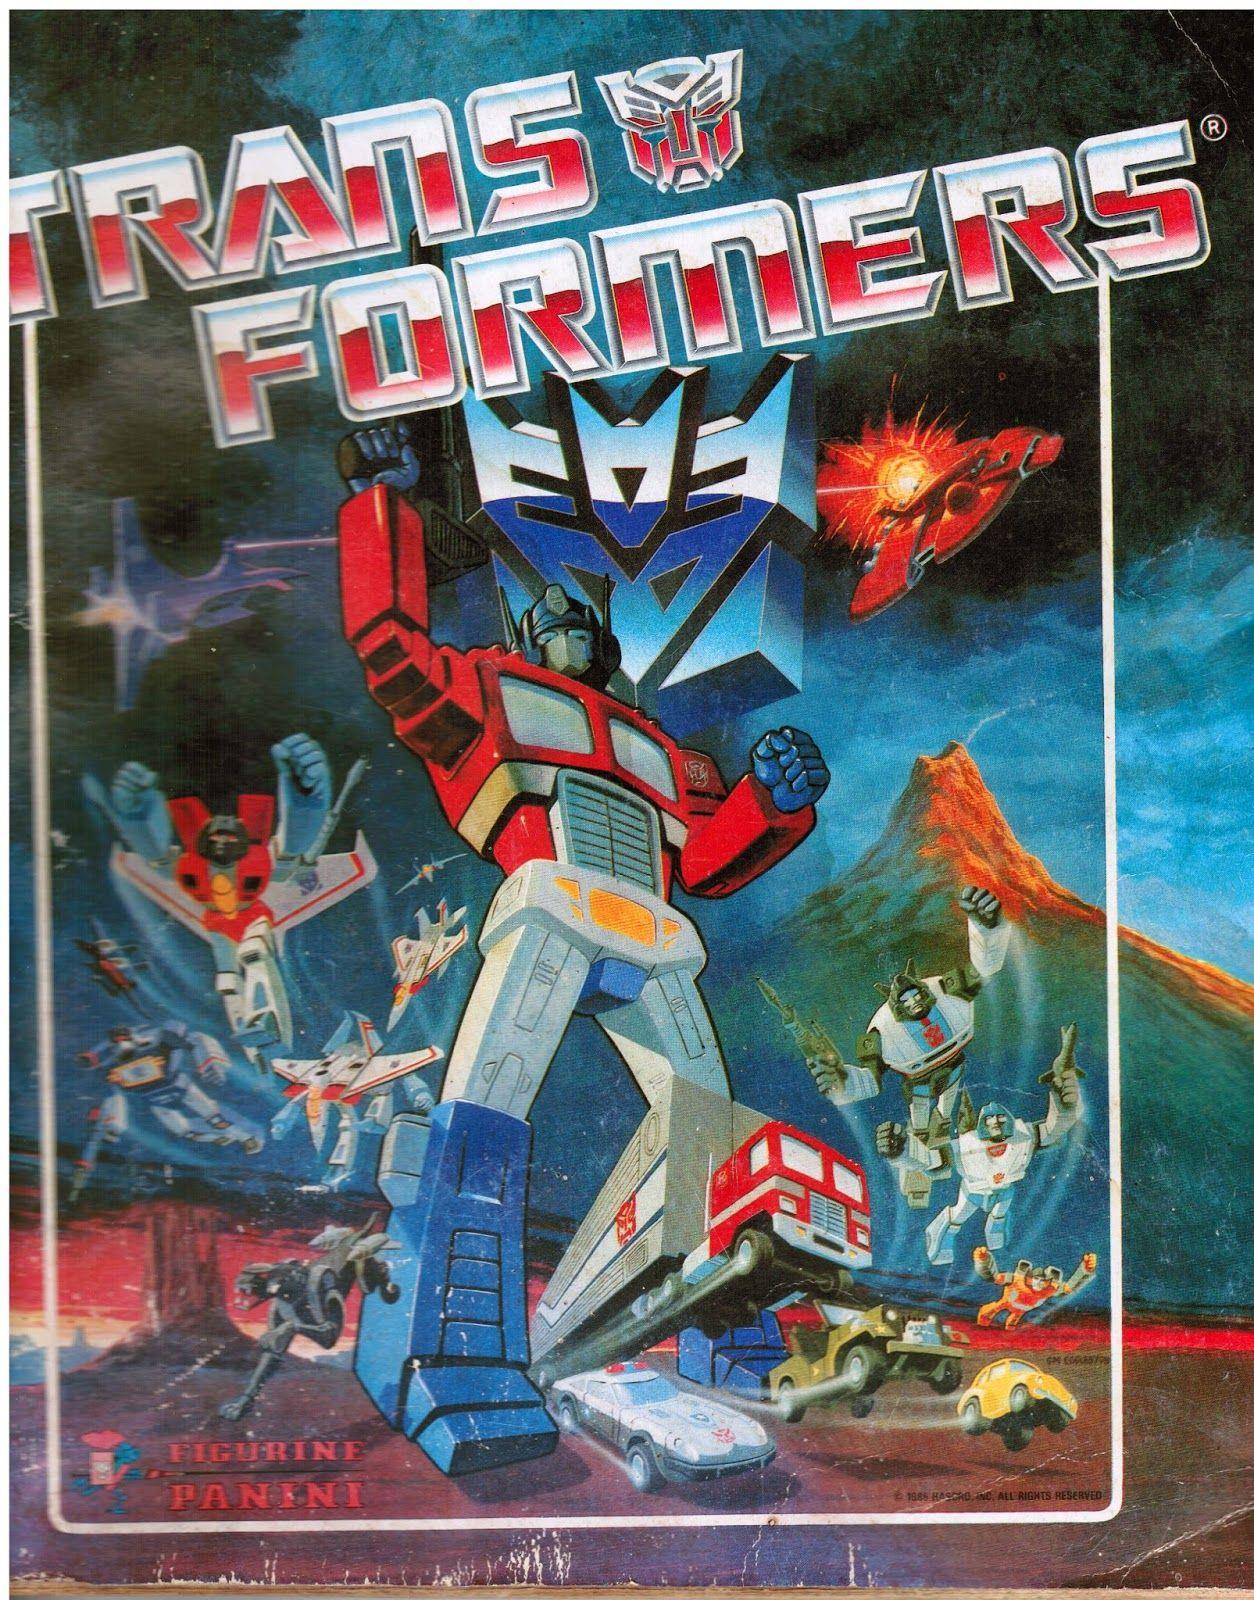 Transformers Panini Sticker Album Geeky Stuff